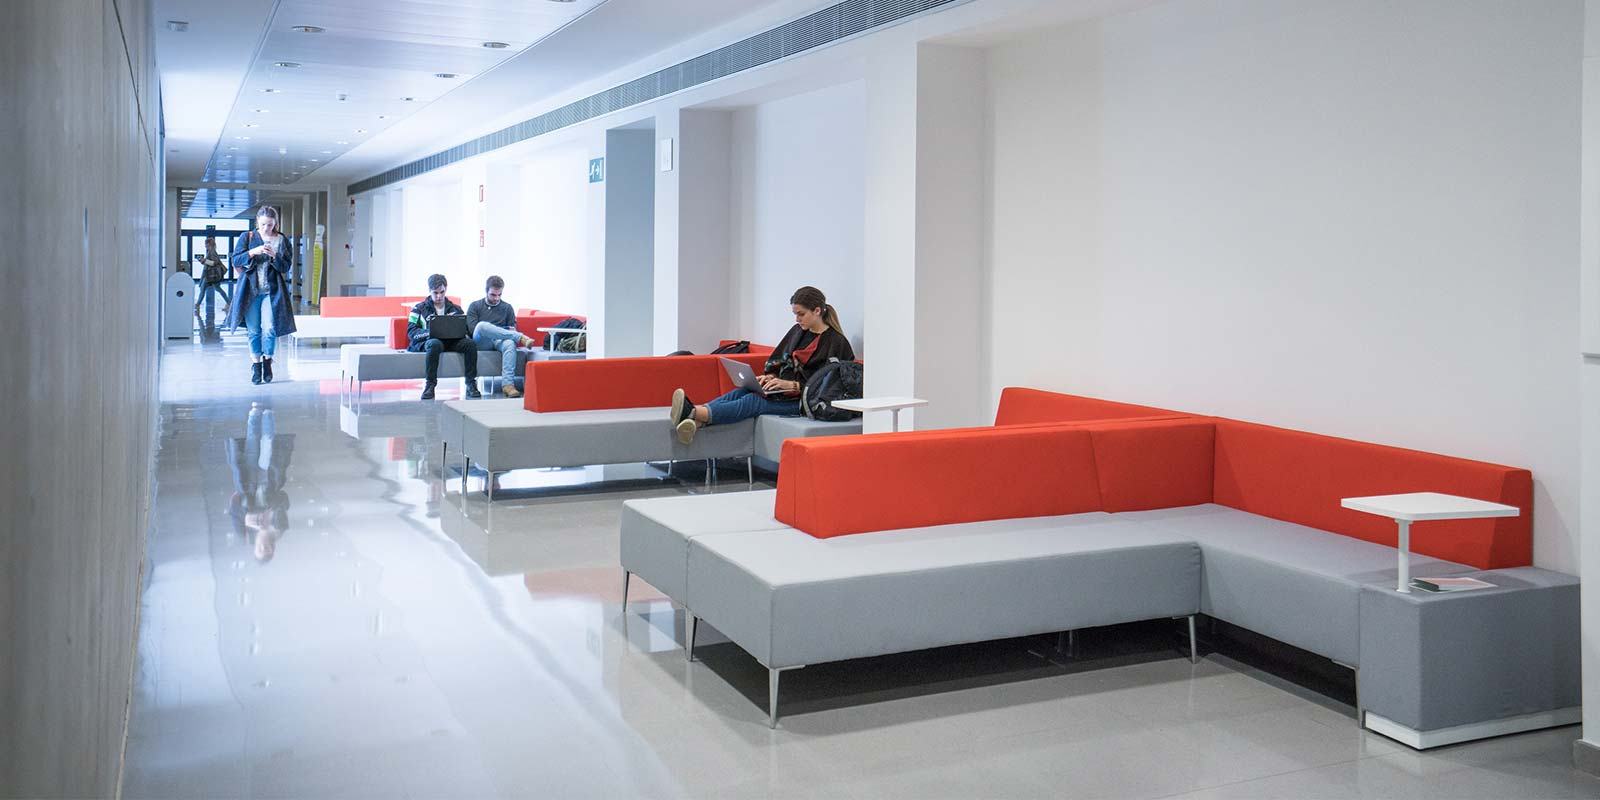 Esade Business School 2